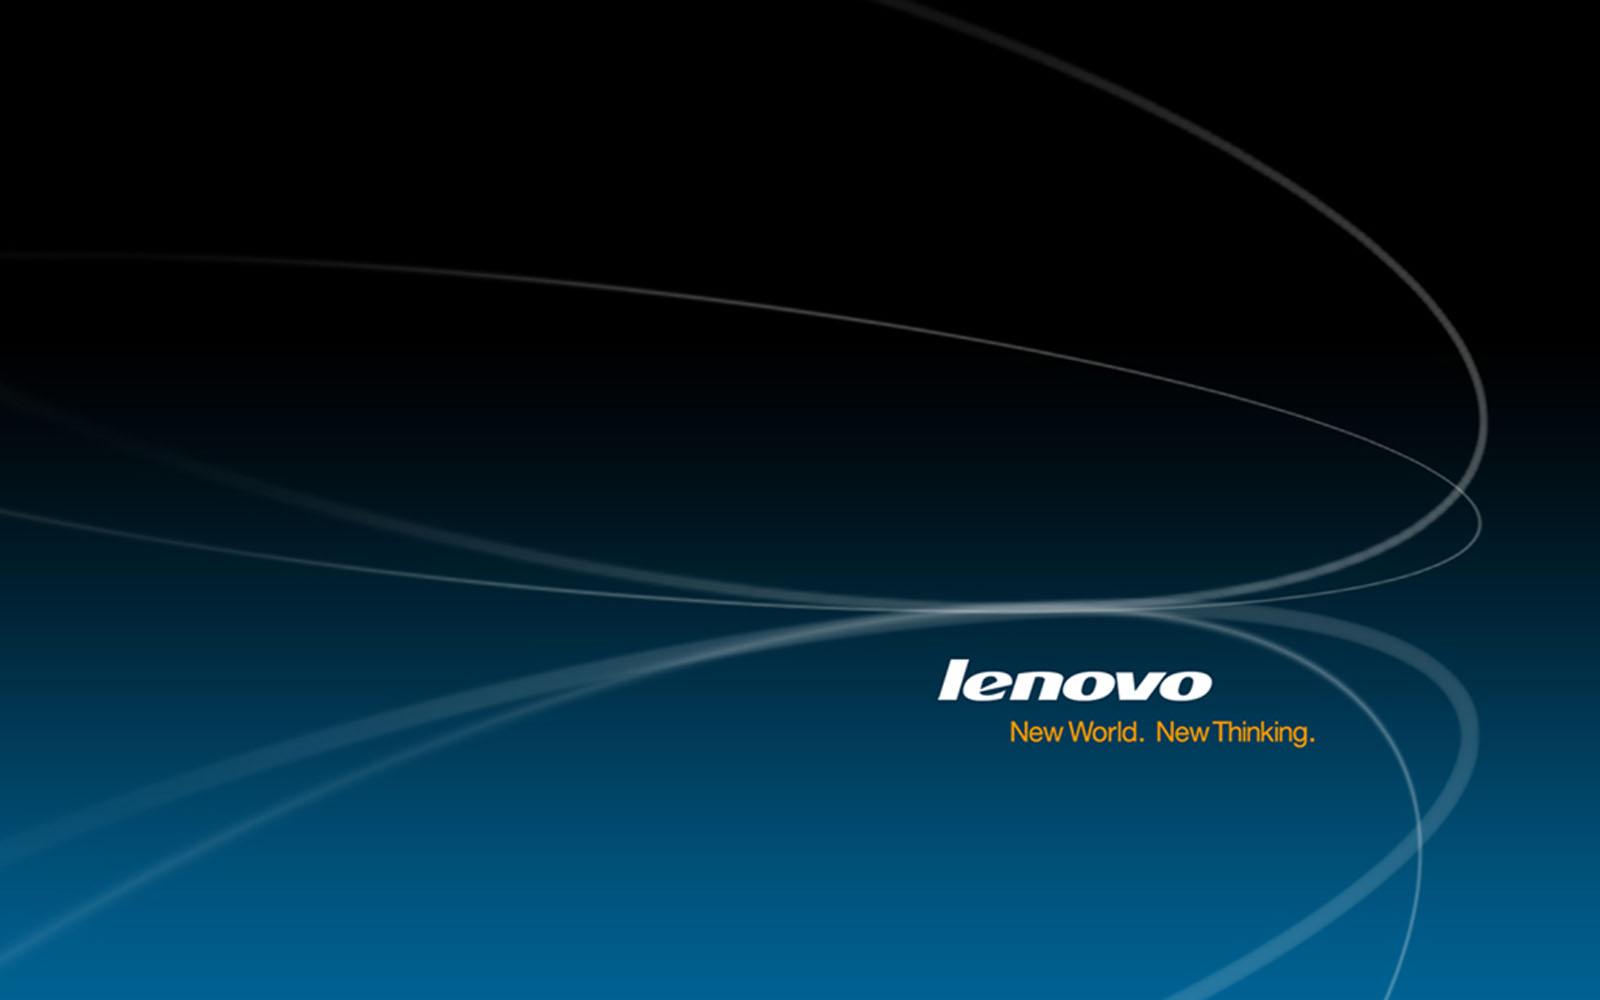 Lenovo Laptop Wallpapers Lenovo Laptop Desktop Wallpapers Lenovo 1600x1000